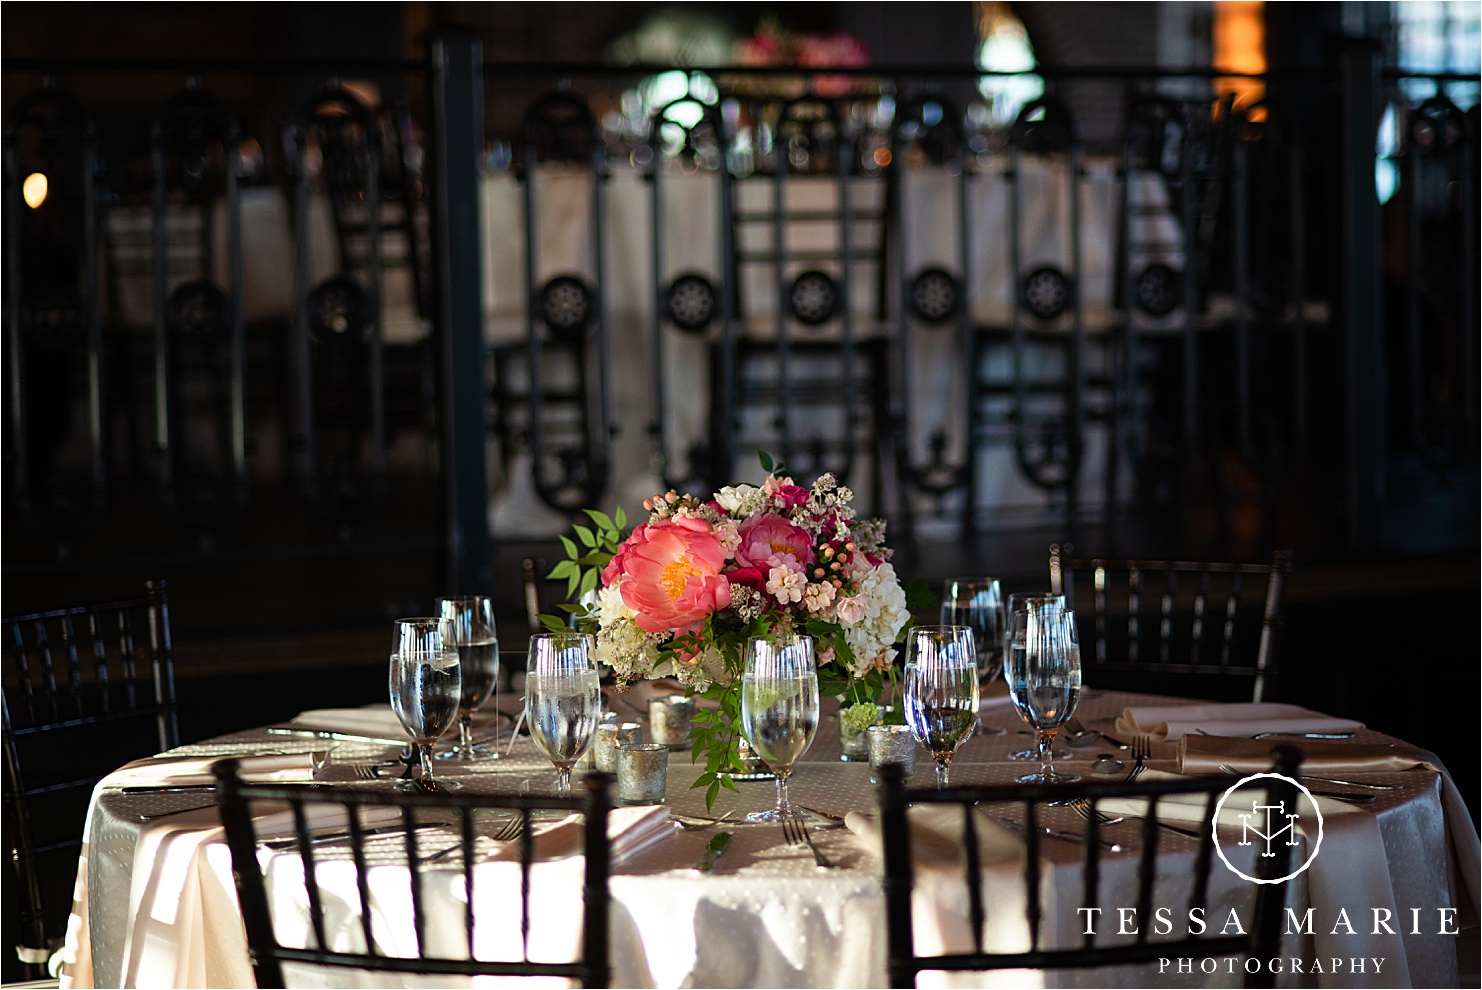 Tessa_marie_weddings_houston_wedding_photographer_The_astorian_0140.jpg